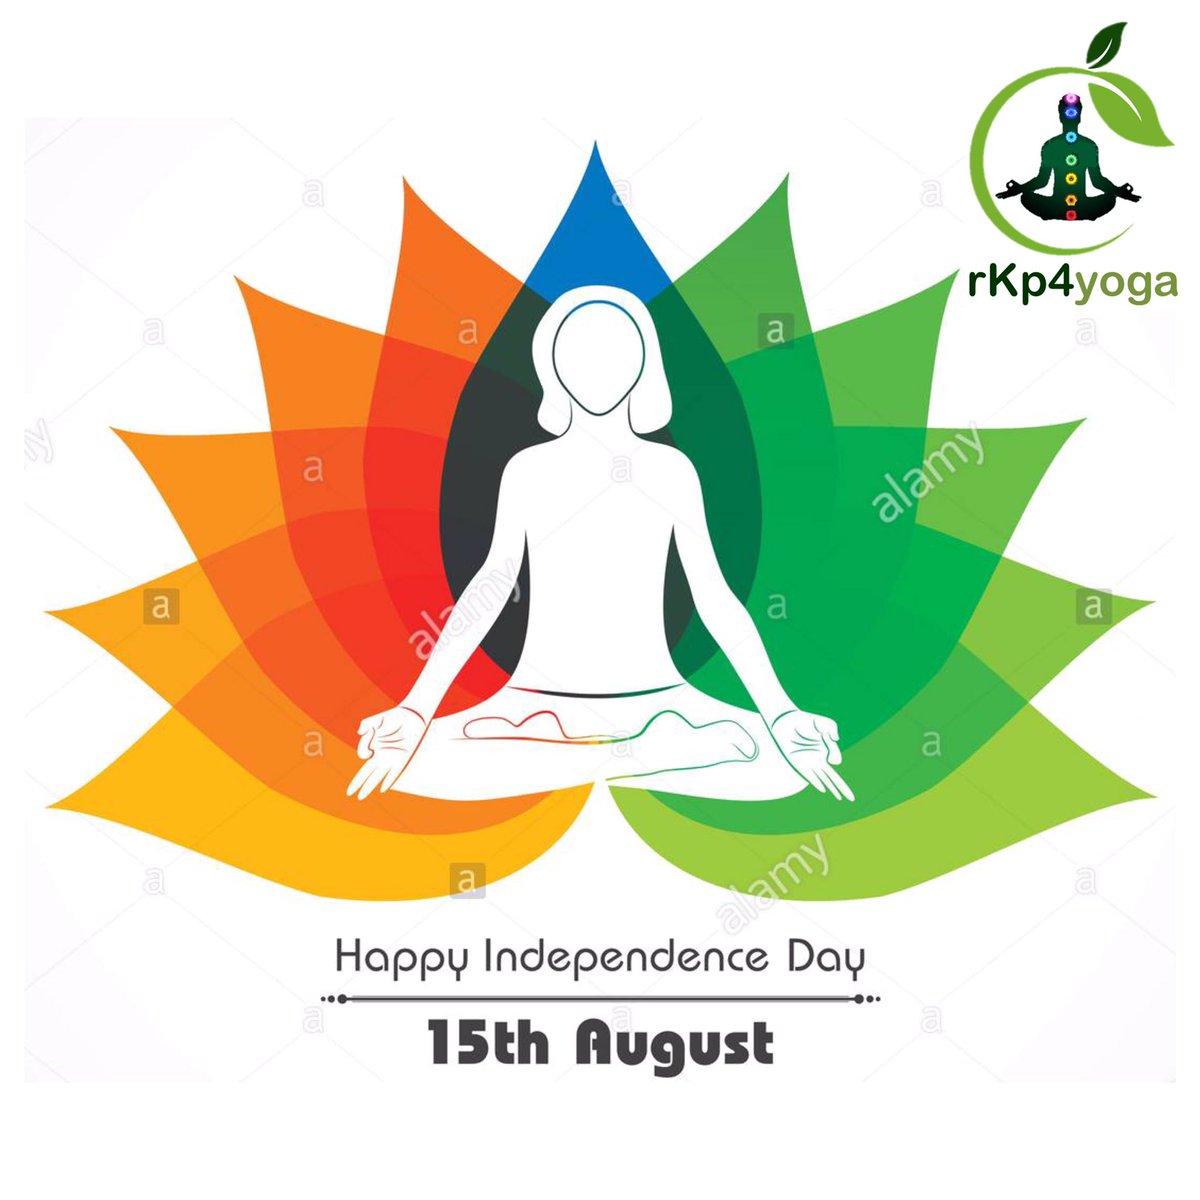 #rkp #ratheesh #rkp4 #independenceday #india #freedom #august15 #independancedayyoga #independence2020 https://t.co/6jQP0R1DoZ